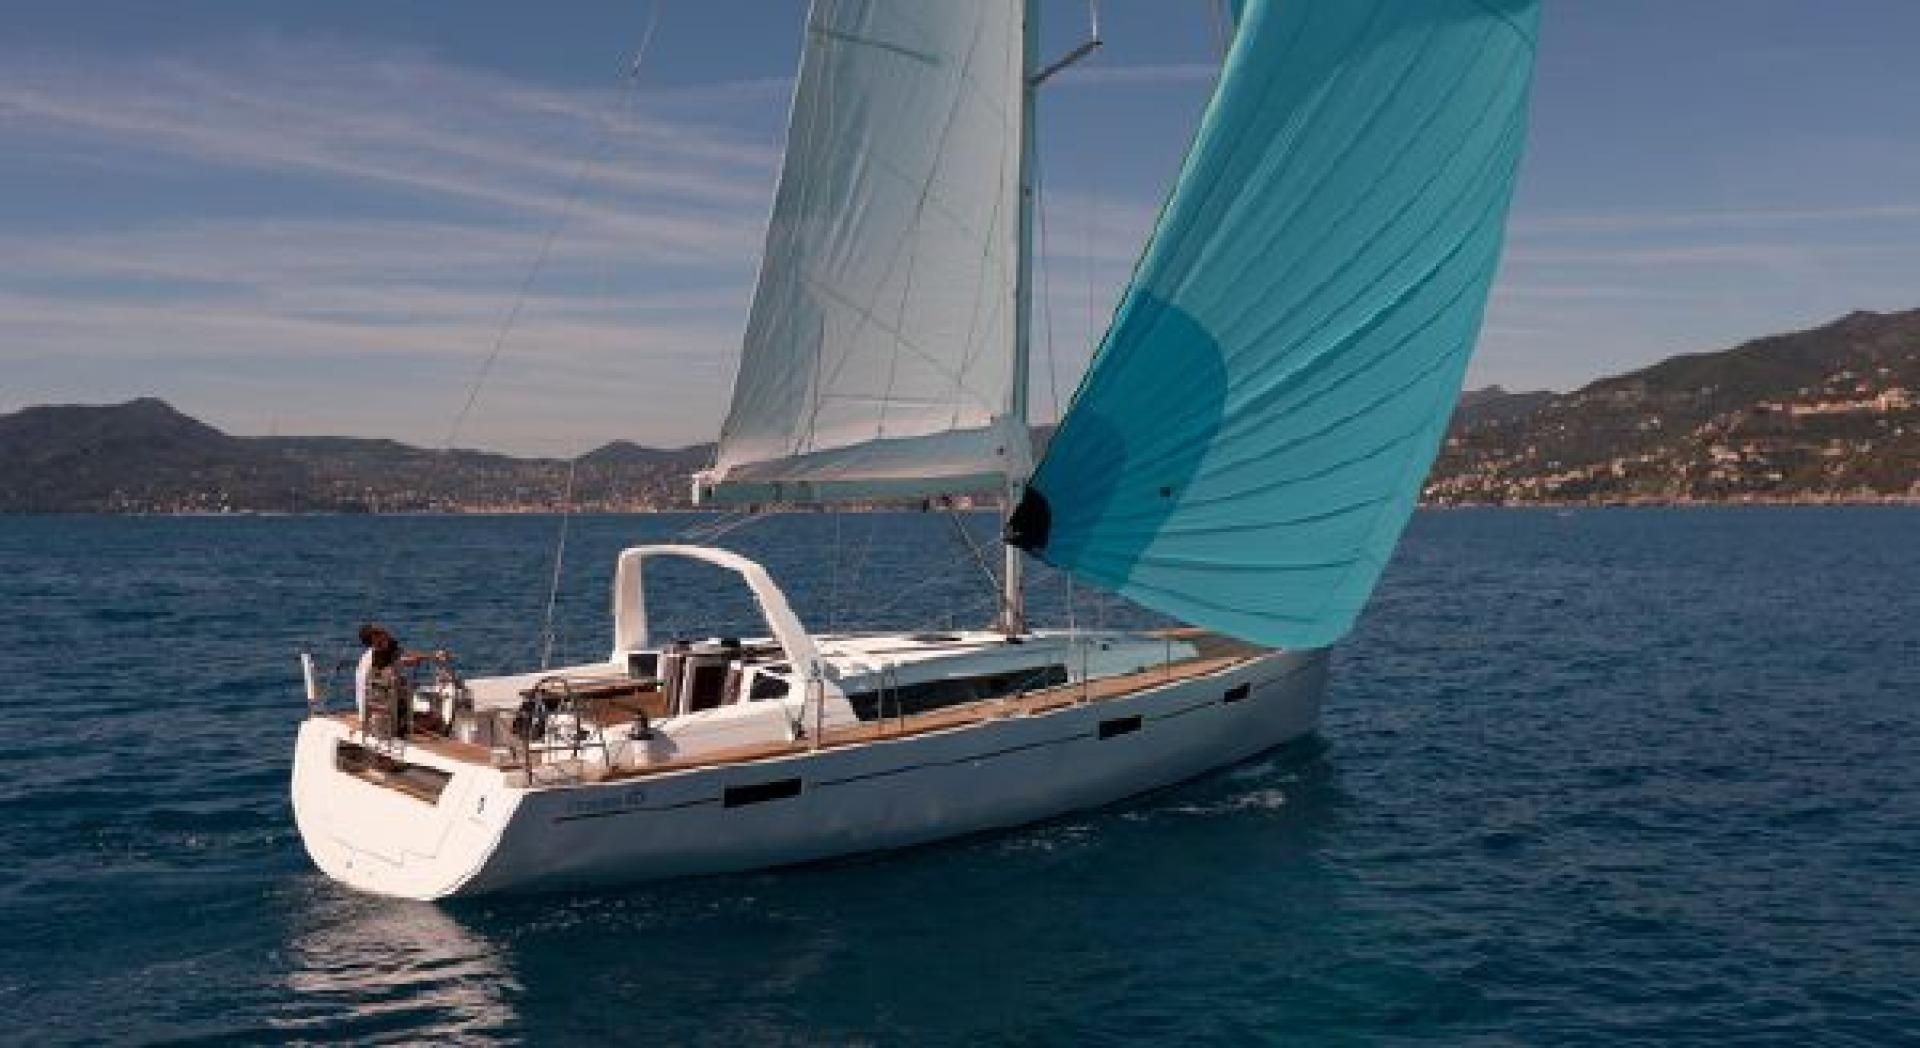 Oceanis 45 sailing in the Carribean